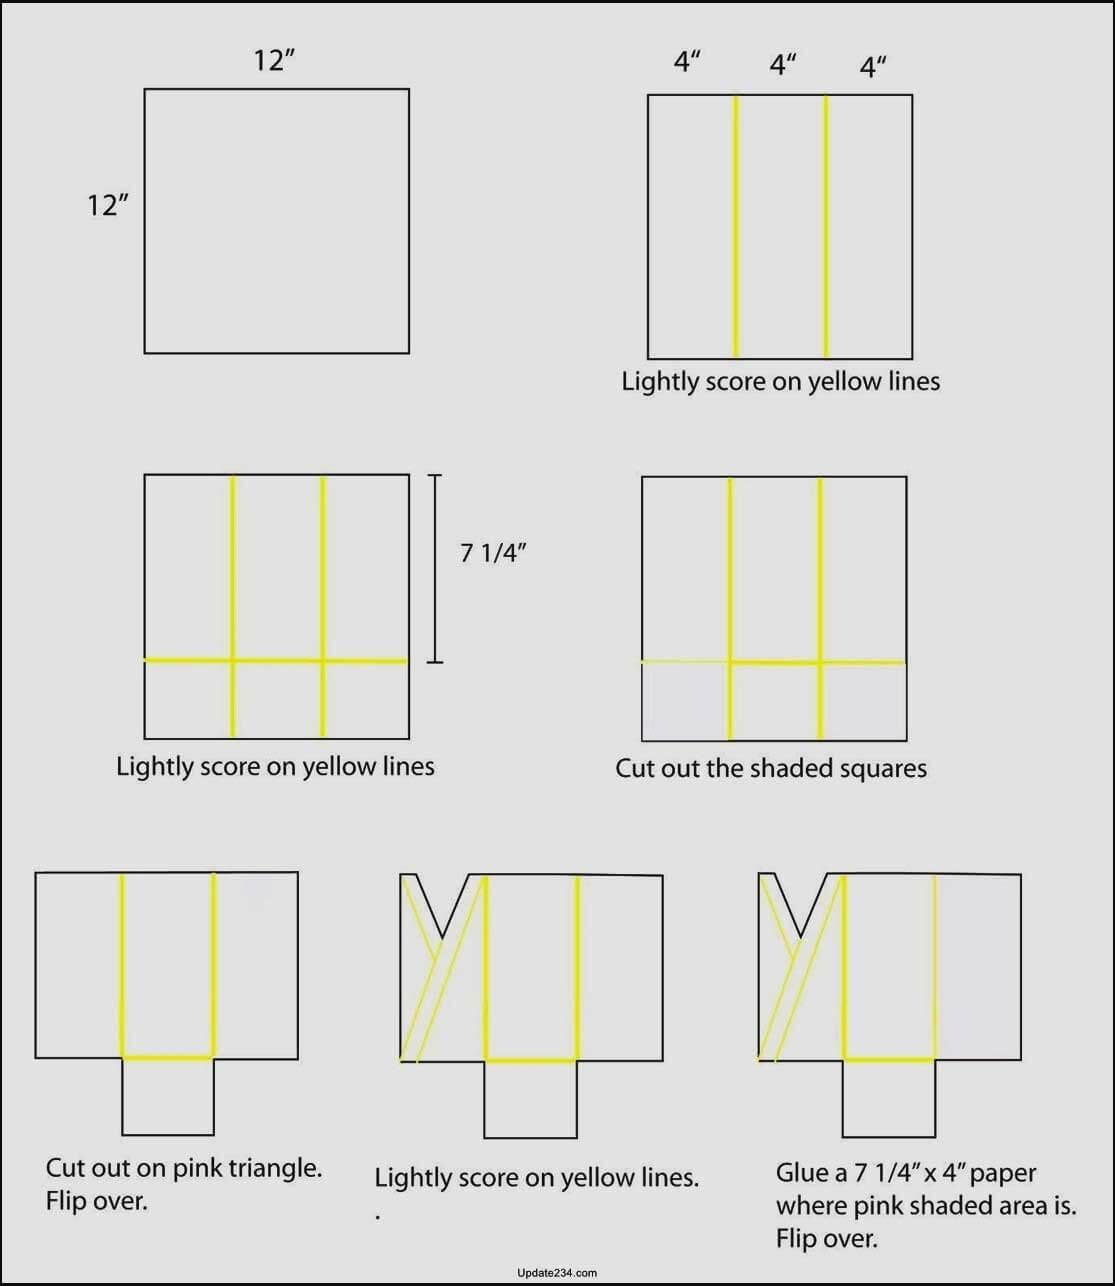 003 Quarter Fold Card Template Word Free Wonderful Ideas inside Blank Quarter Fold Card Template